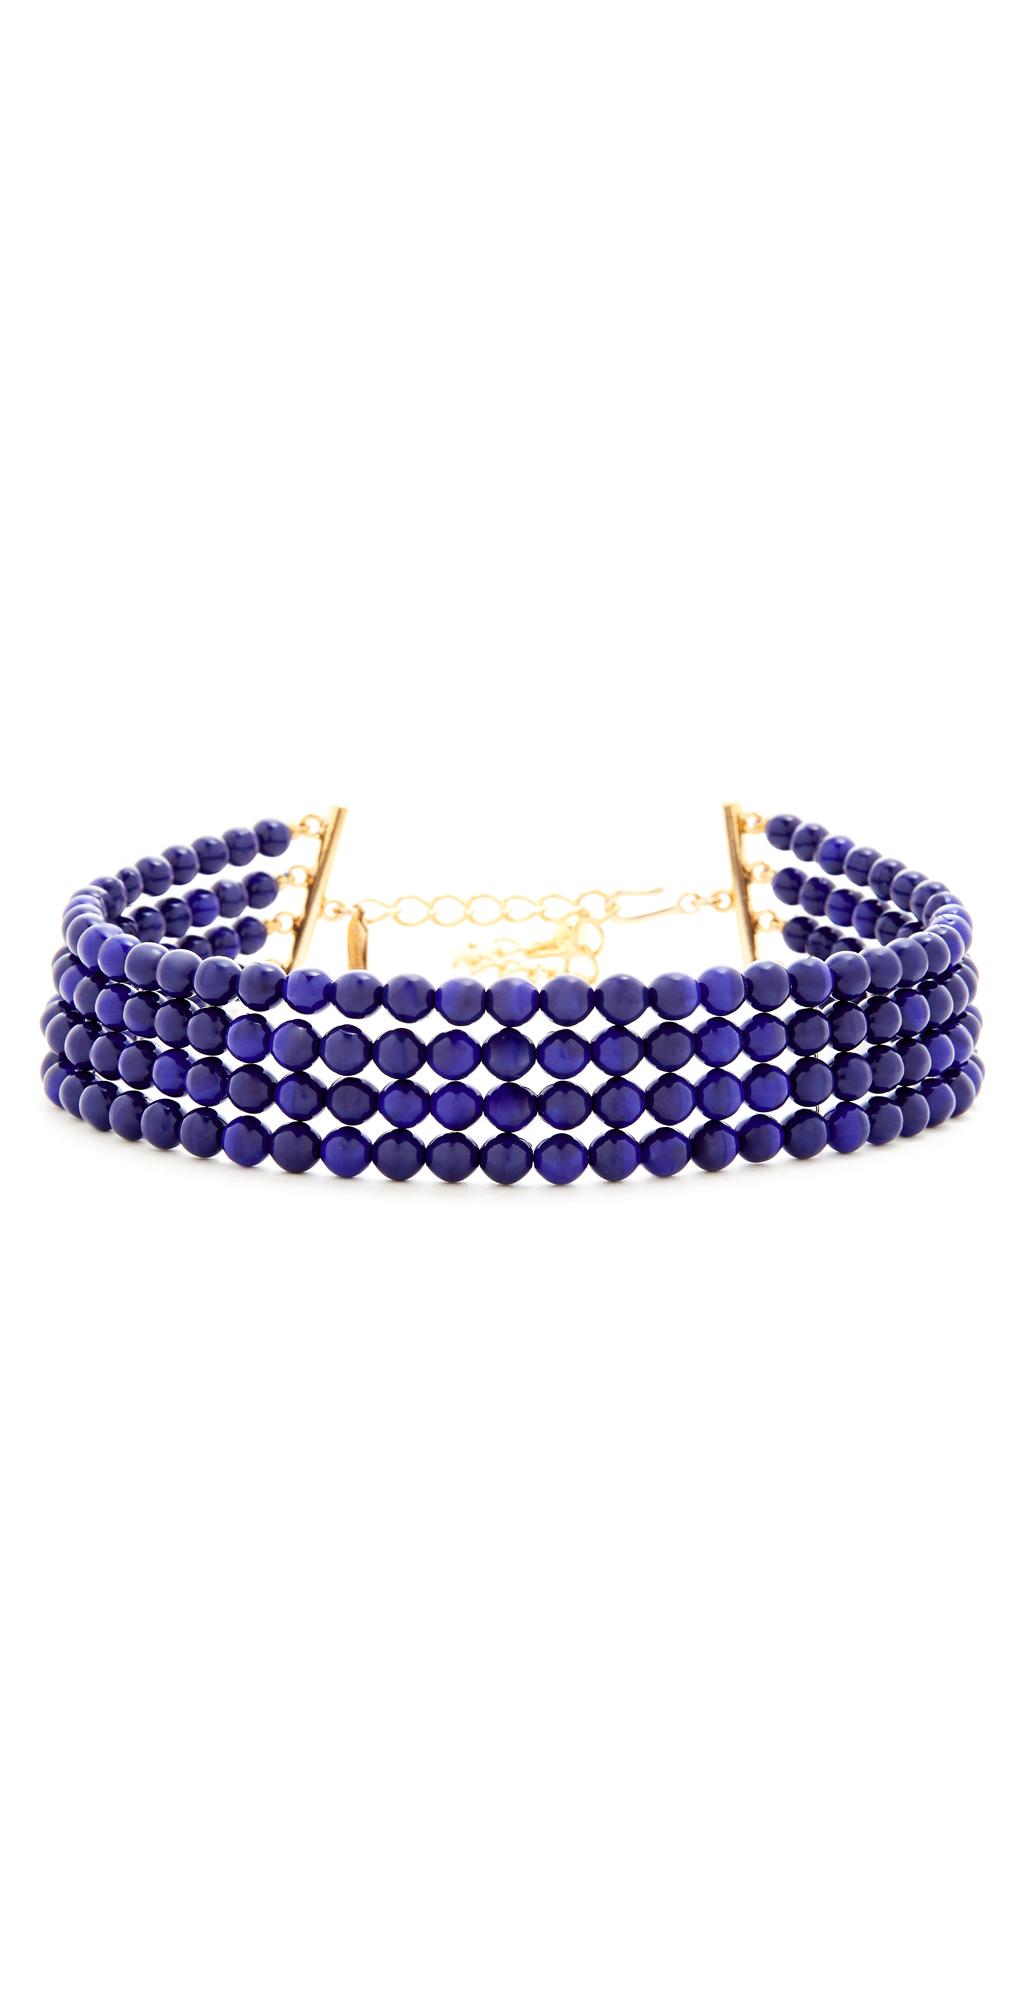 Kenneth Jay Lane Bead Dog Collar Necklace